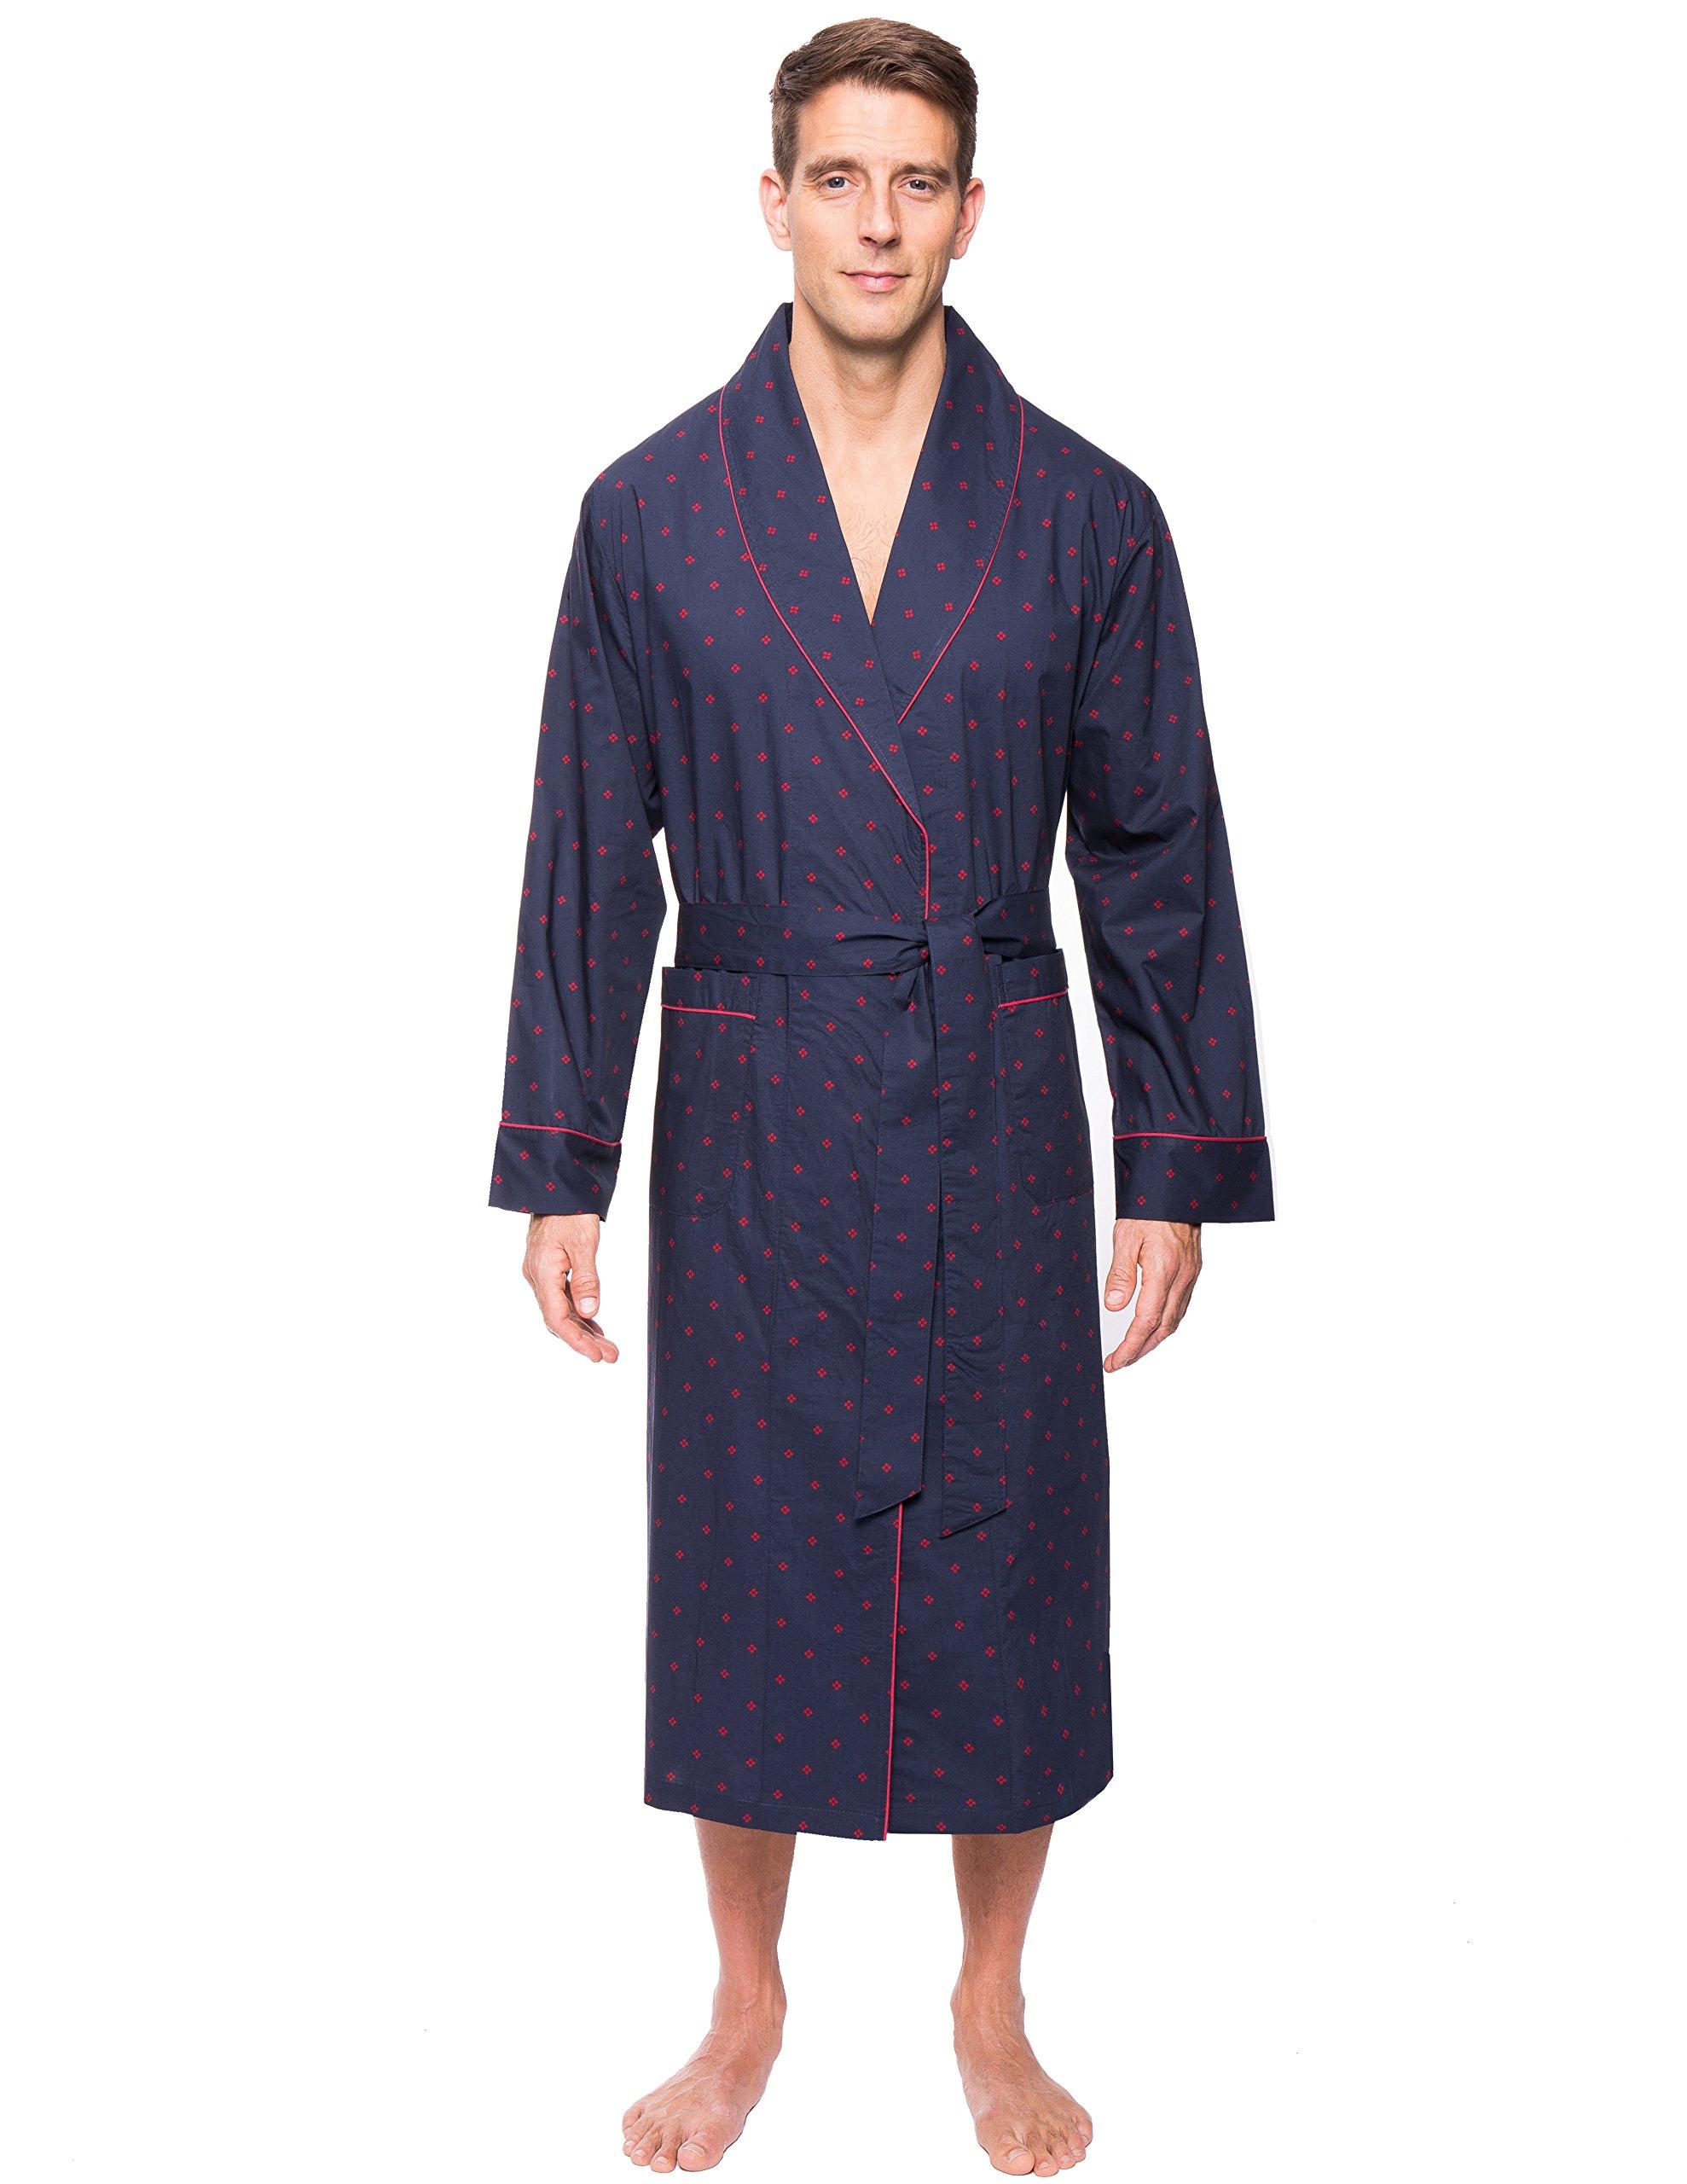 Men's 100% Premium Cotton Robe - Diamond Checks Black/Red - L/XL by Noble Mount (Image #1)